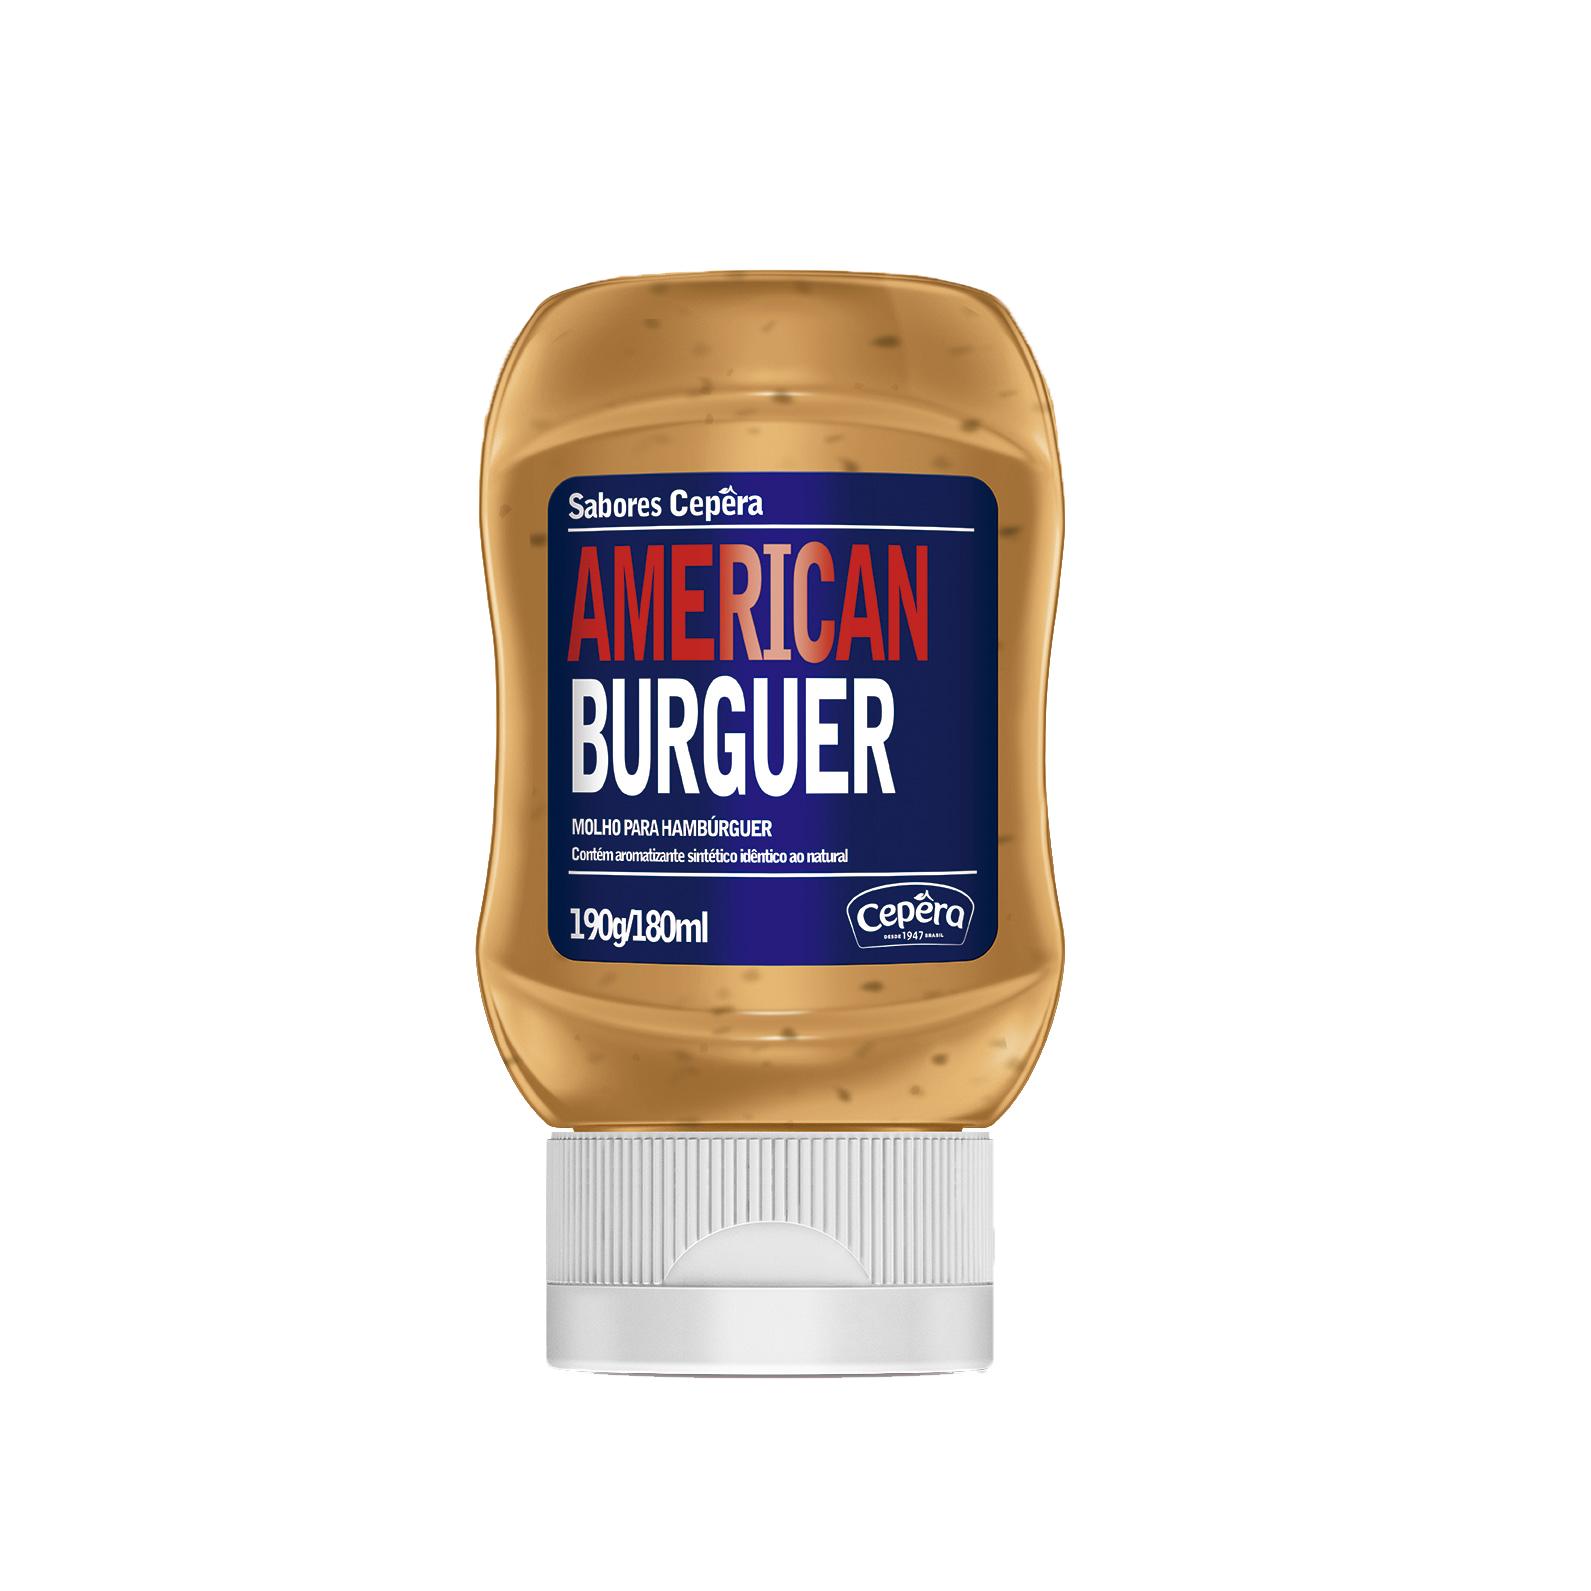 American Burguer (Sabores Cepêra)